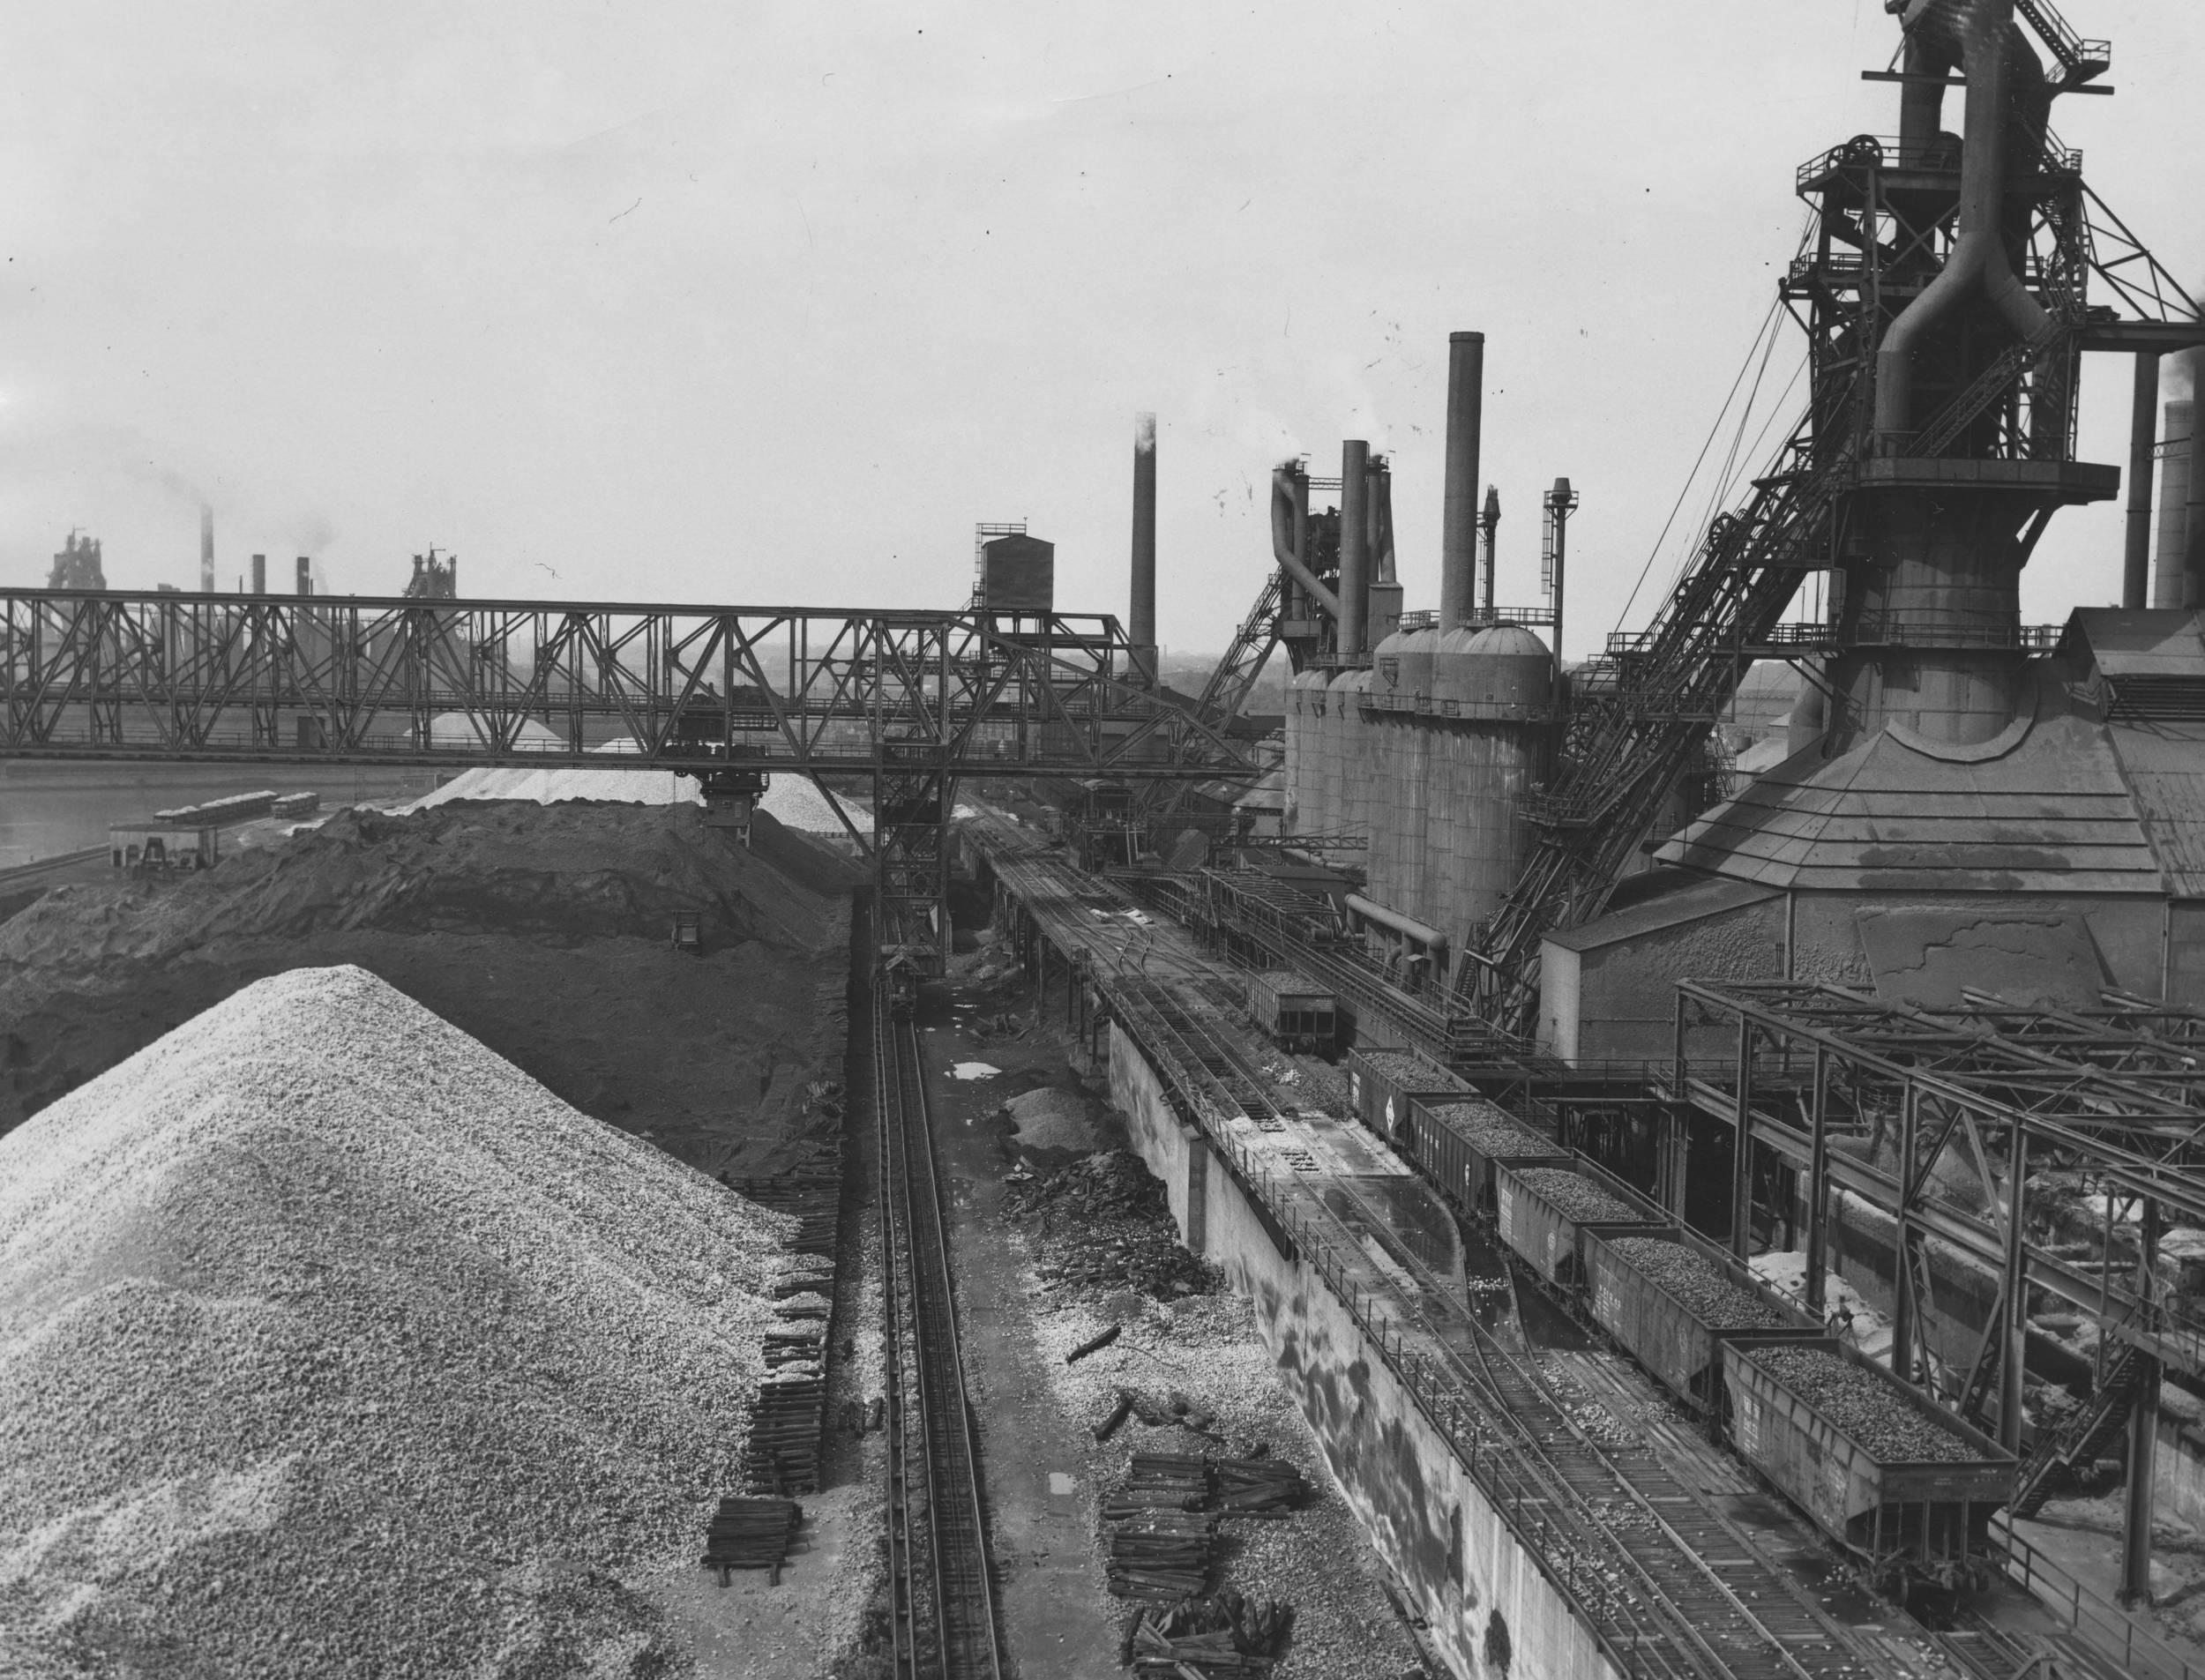 Jones_and_Laughlin_Steel_1955.jpg